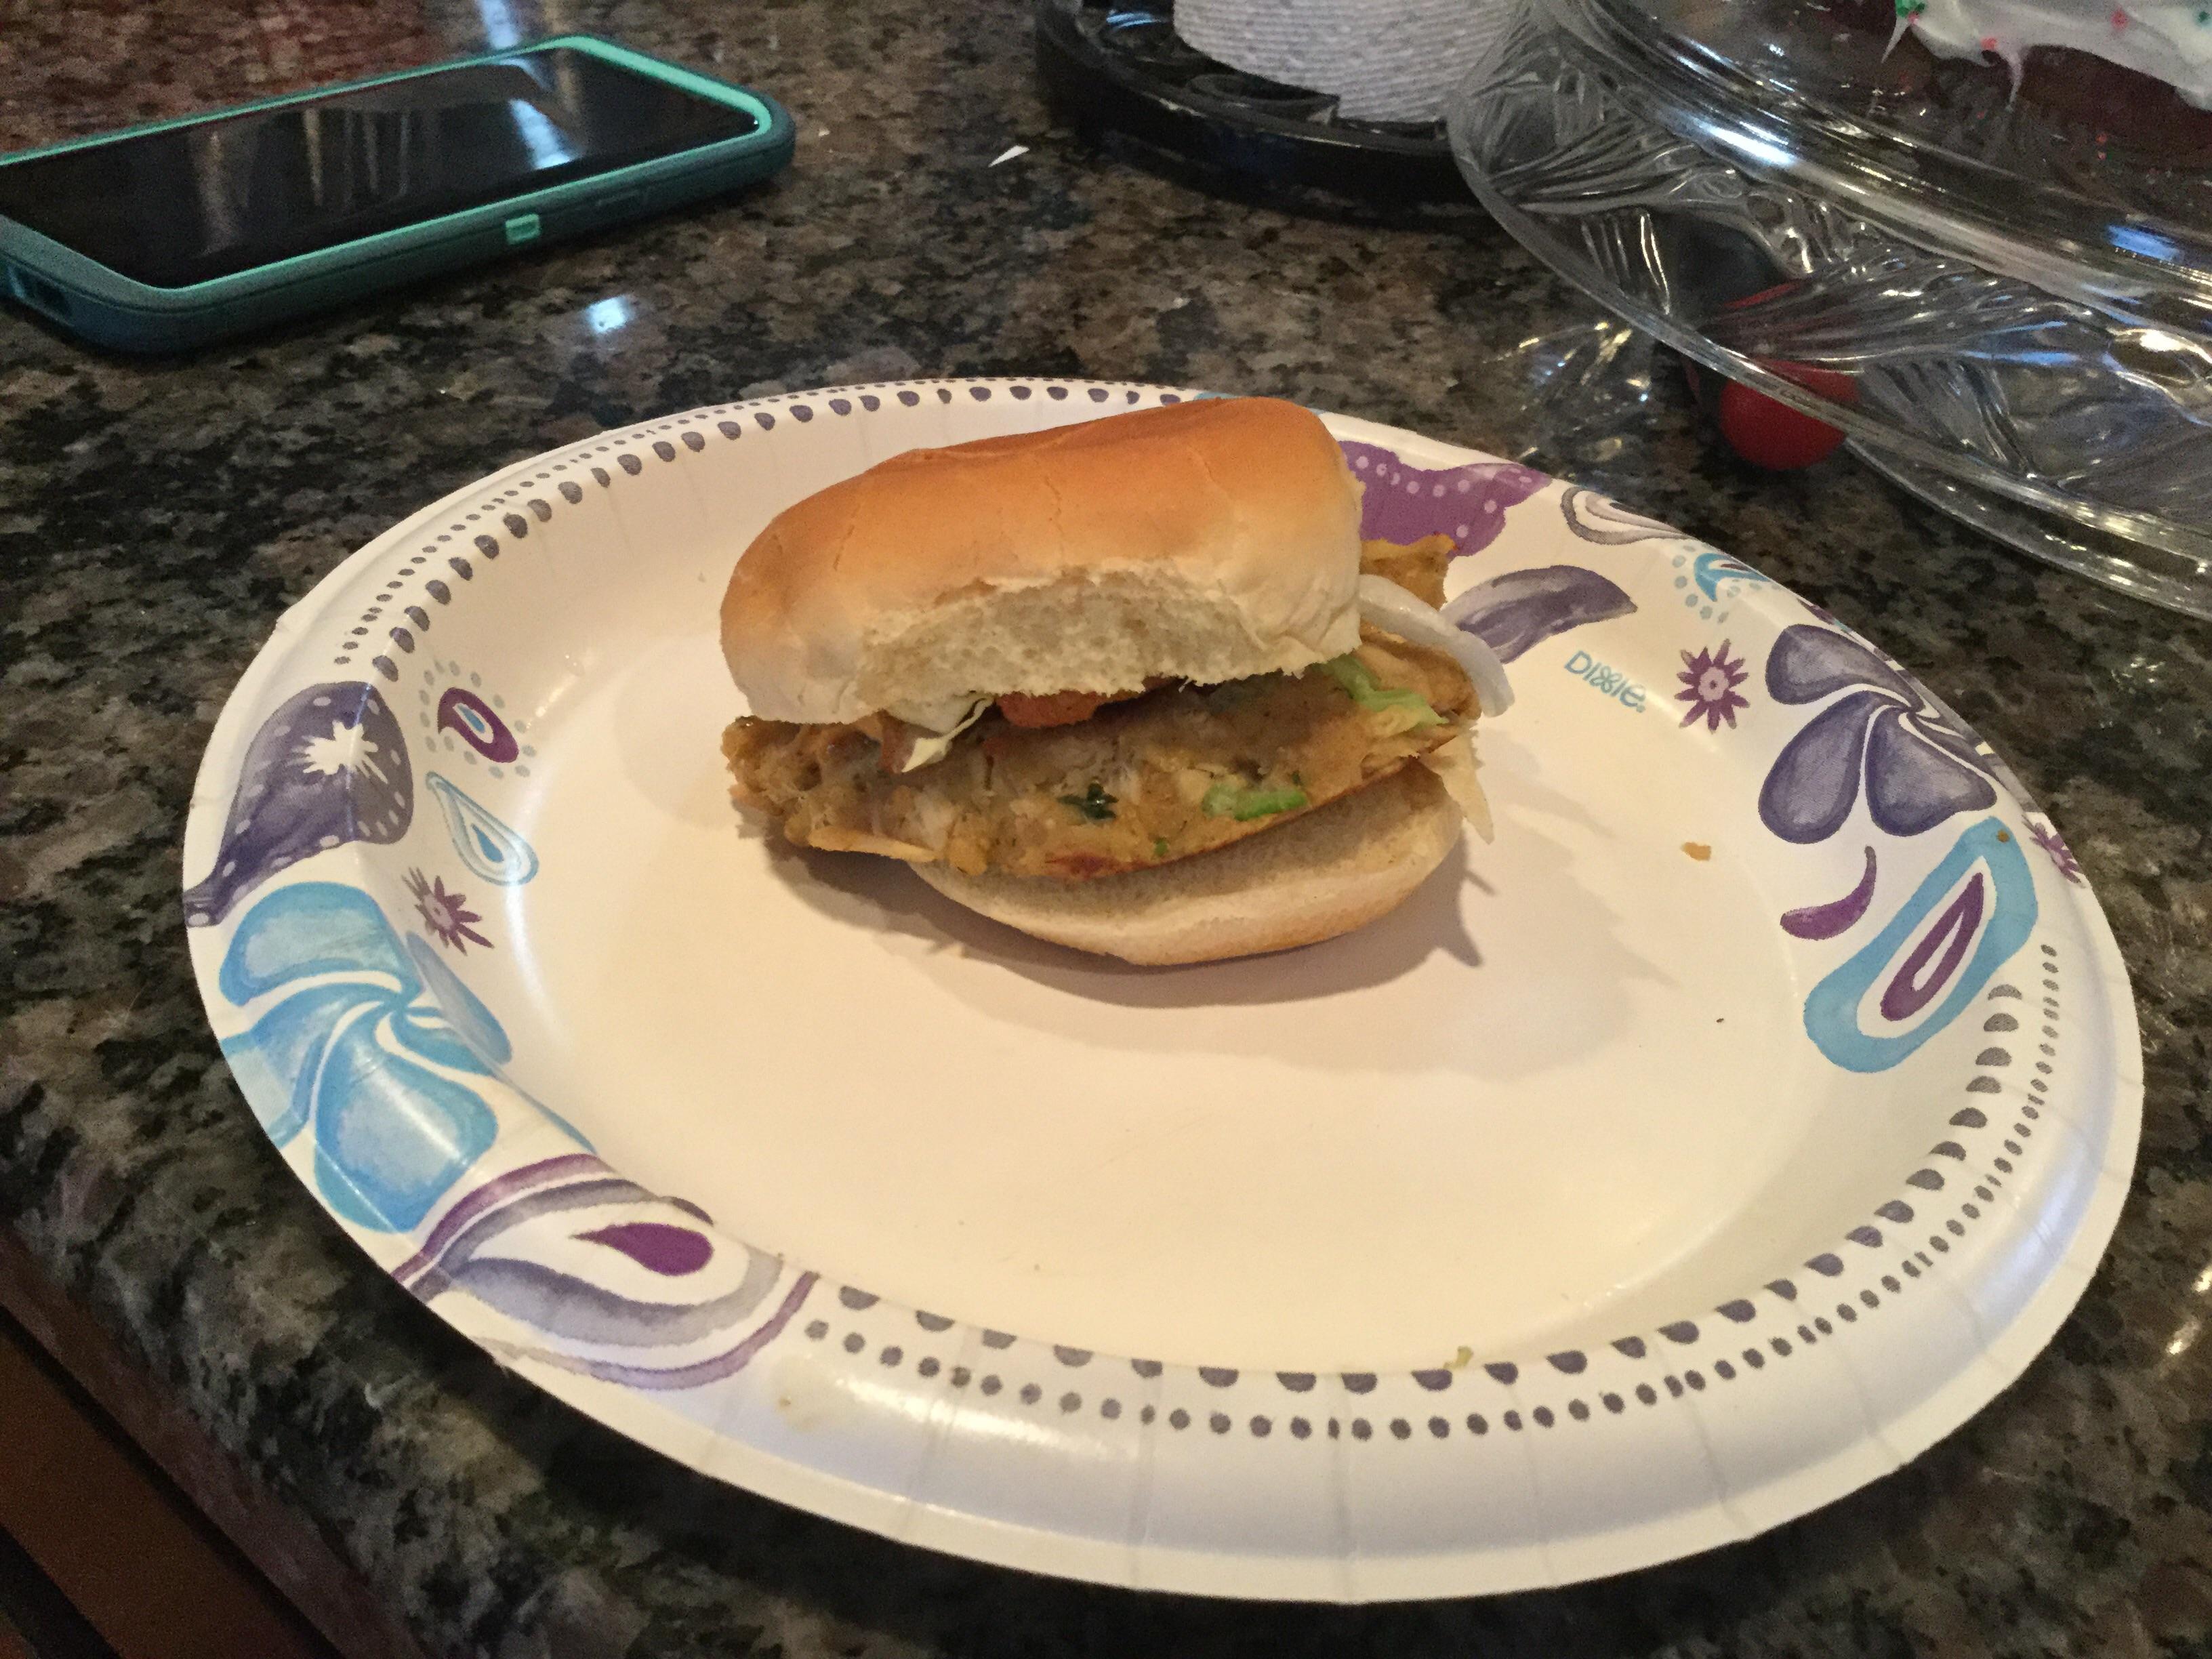 Tasty Tuna Burgers